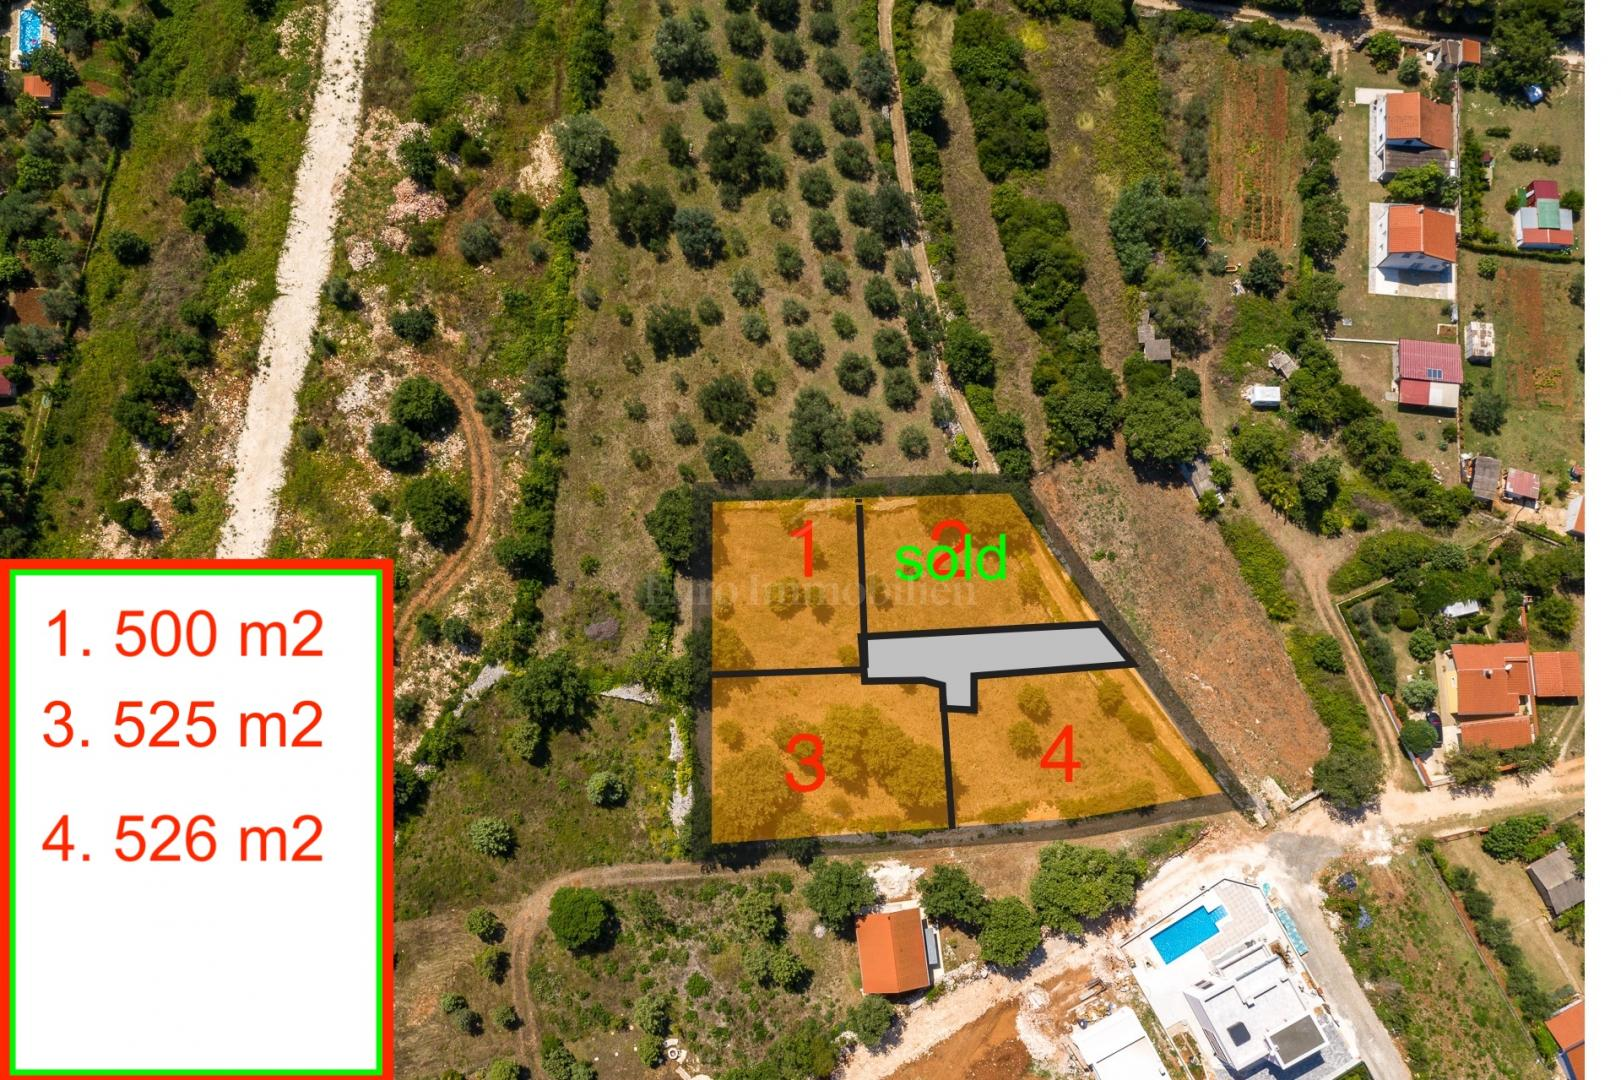 Građevinsko zemljište 525 m2!